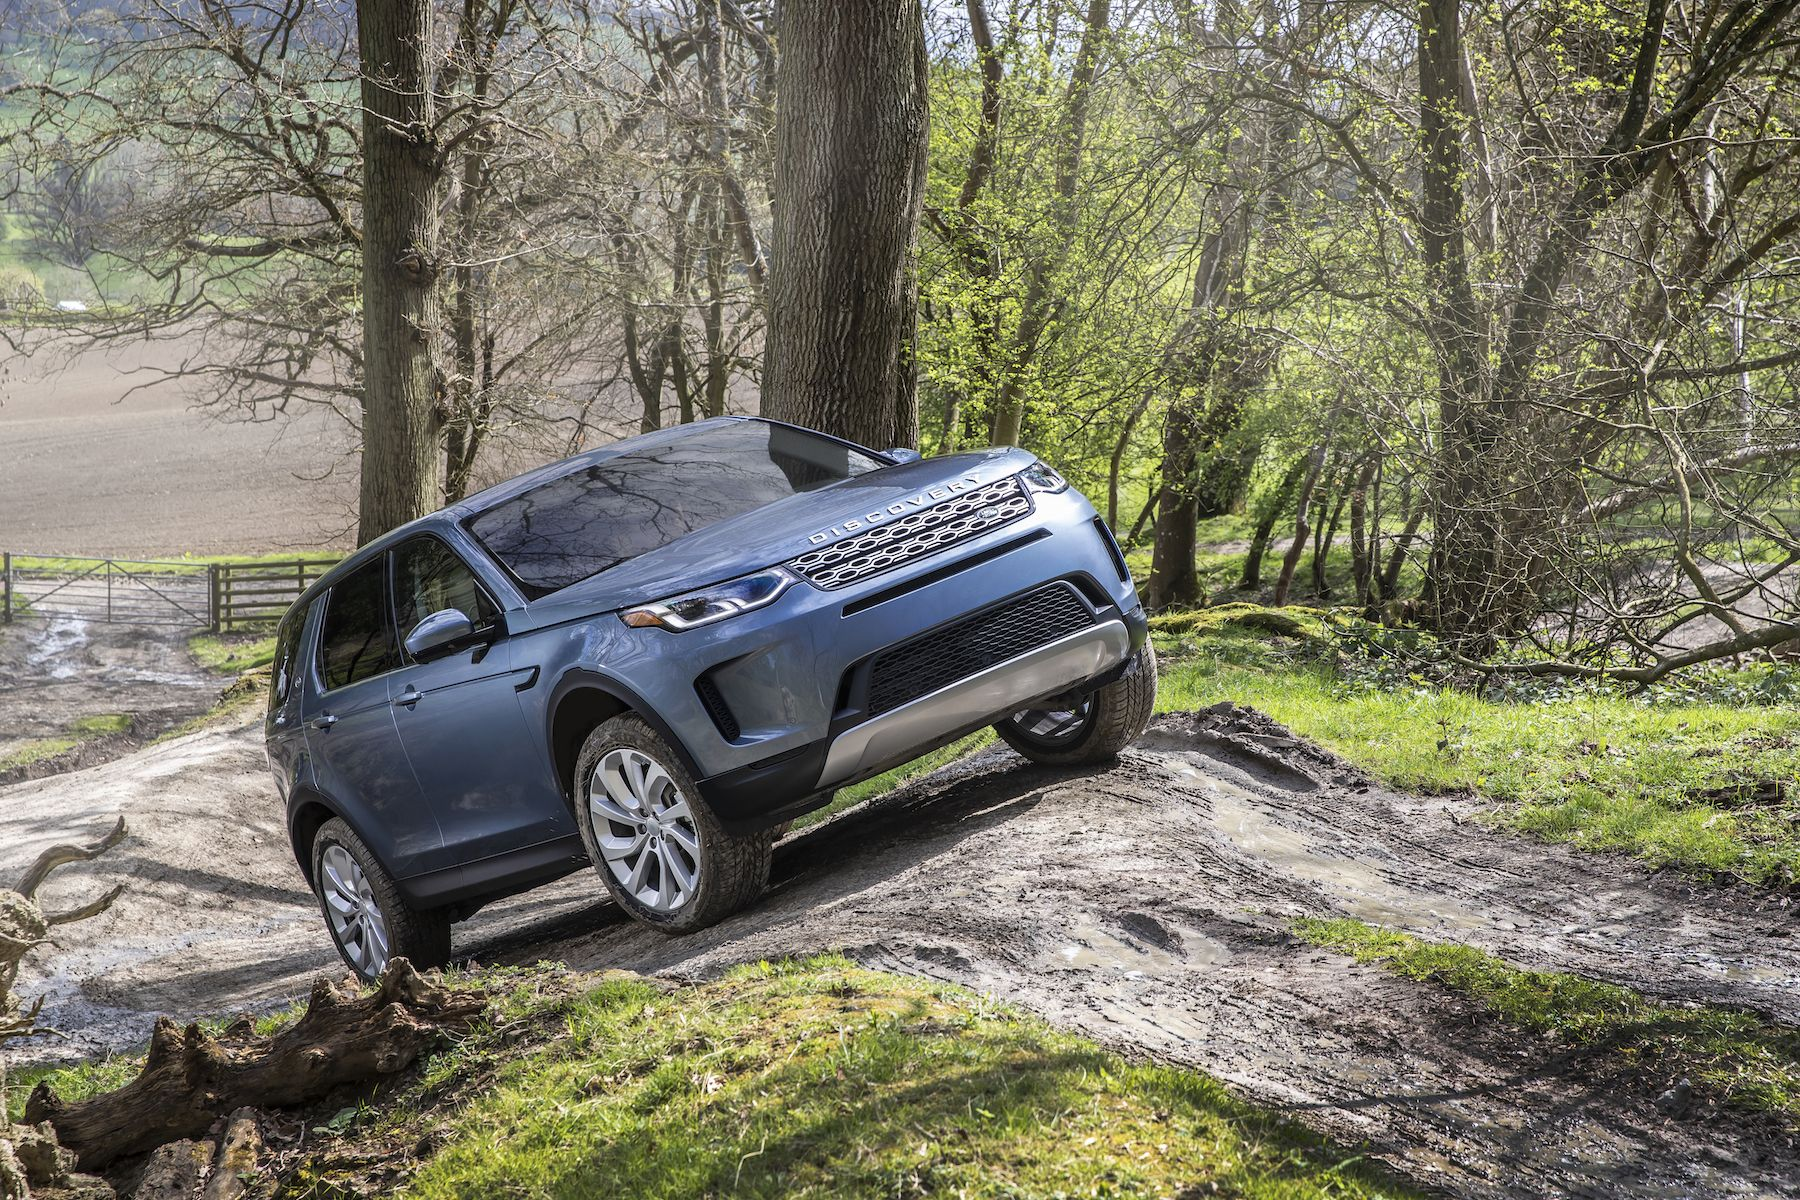 2019 Land Rover Discovery Sport: News, Design, Specs, Price >> The 2020 Land Rover Discovery Sport Adds Style And A Hybrid